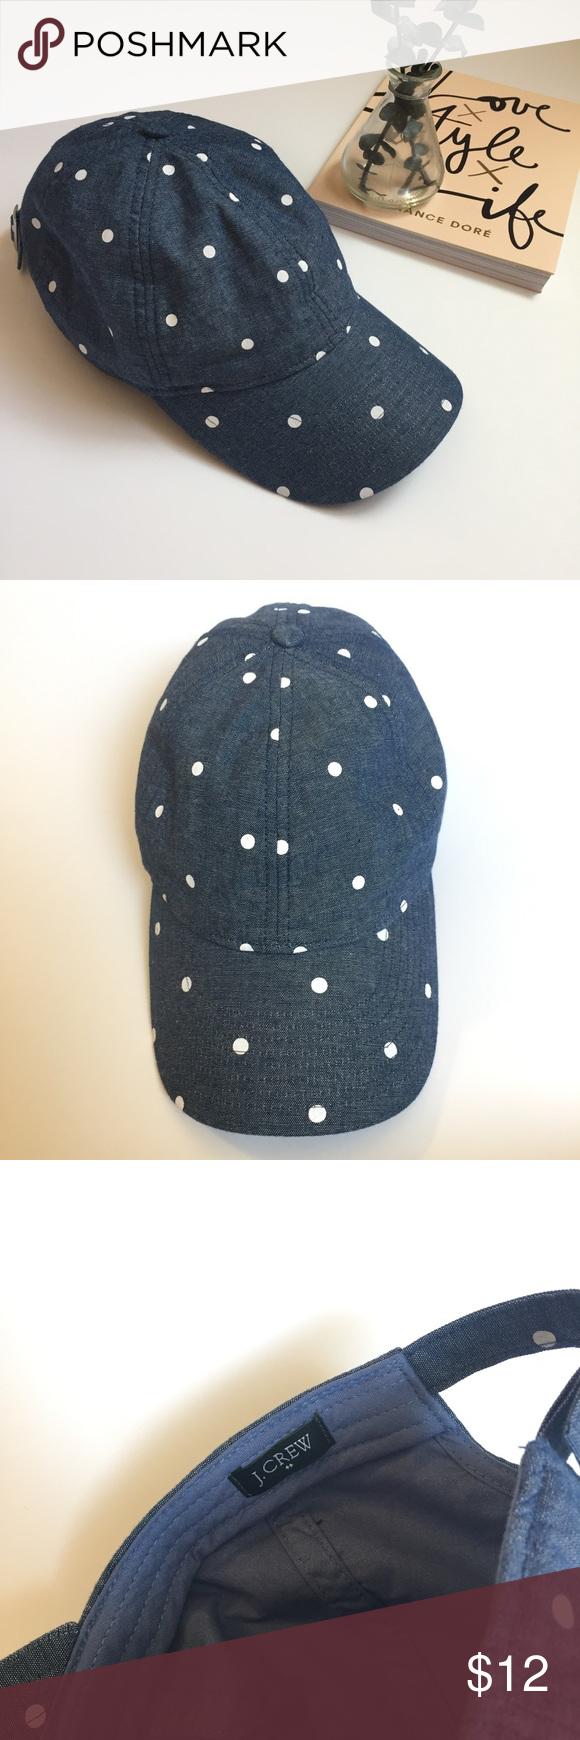 227a8b06a2a3c J. Crew Chambray Dot Baseball Cap Like new J. Crew Factory chambray dot baseball  cap. Worn once